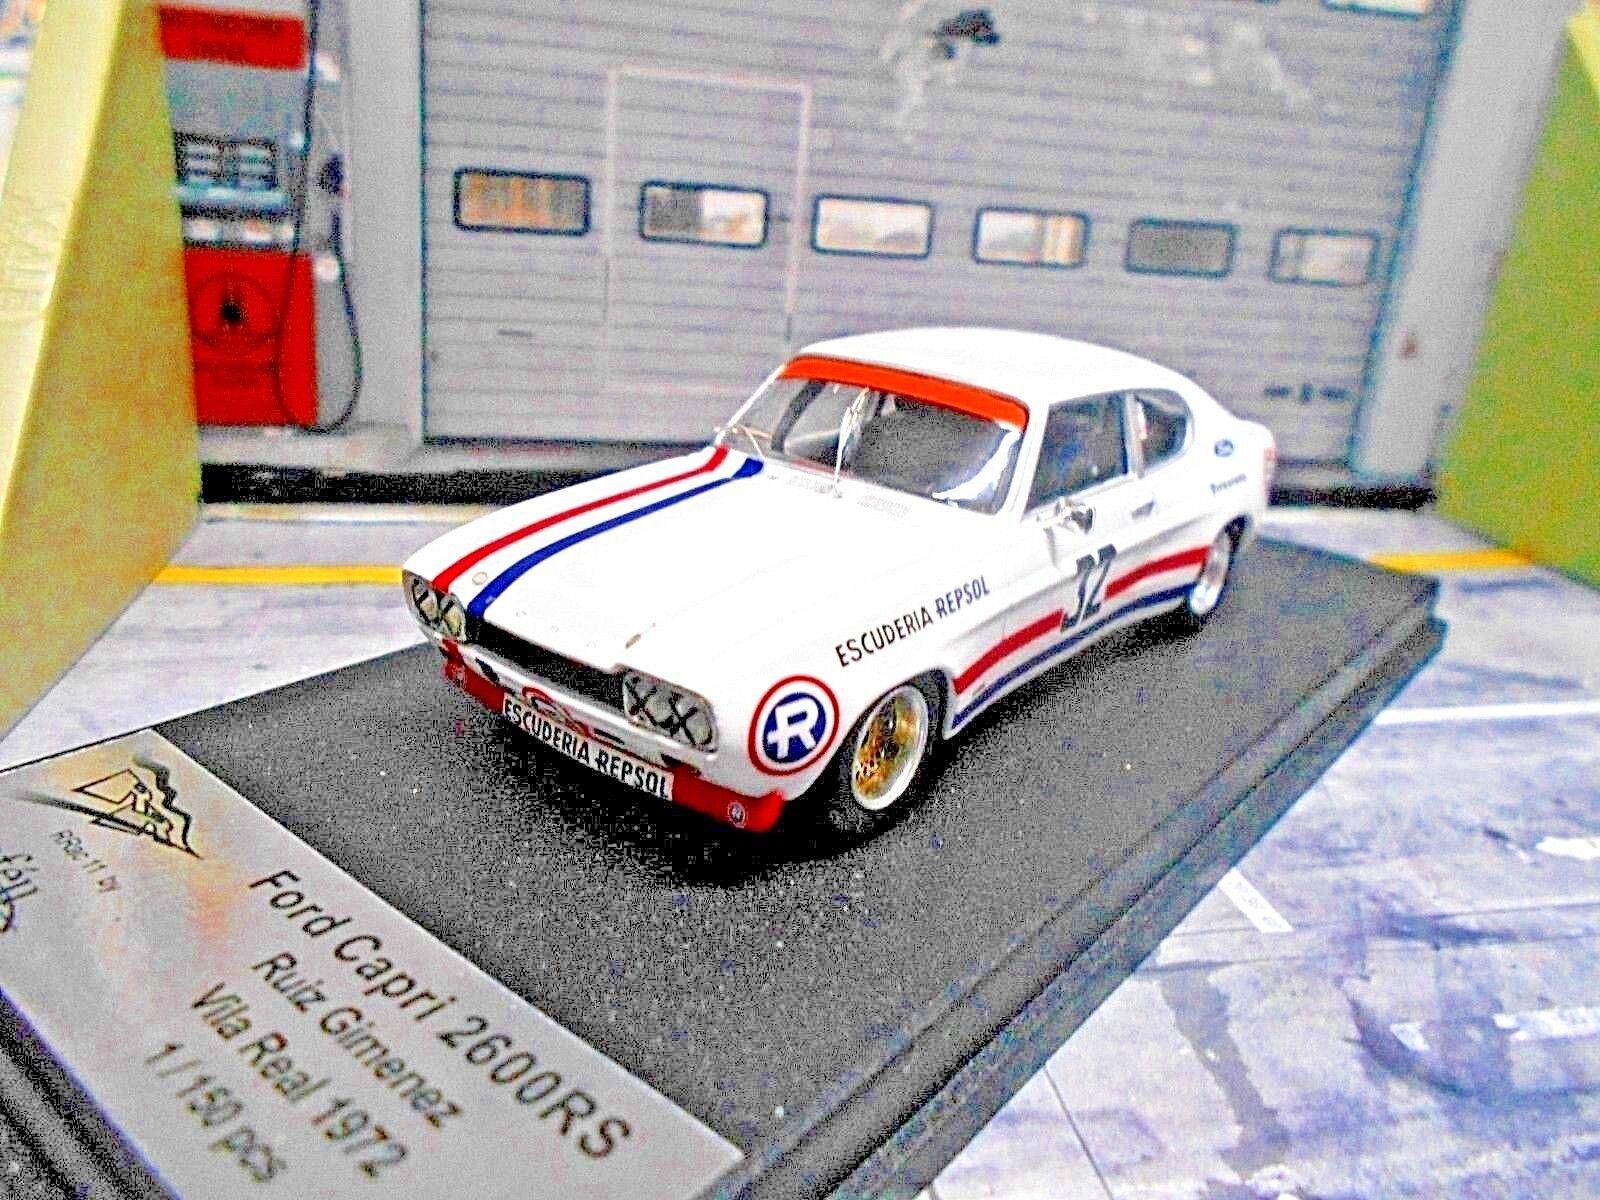 Ford Capri RS 2600 Rallye Race villa real Gimenez repsol 1972 Trofeu 1 43